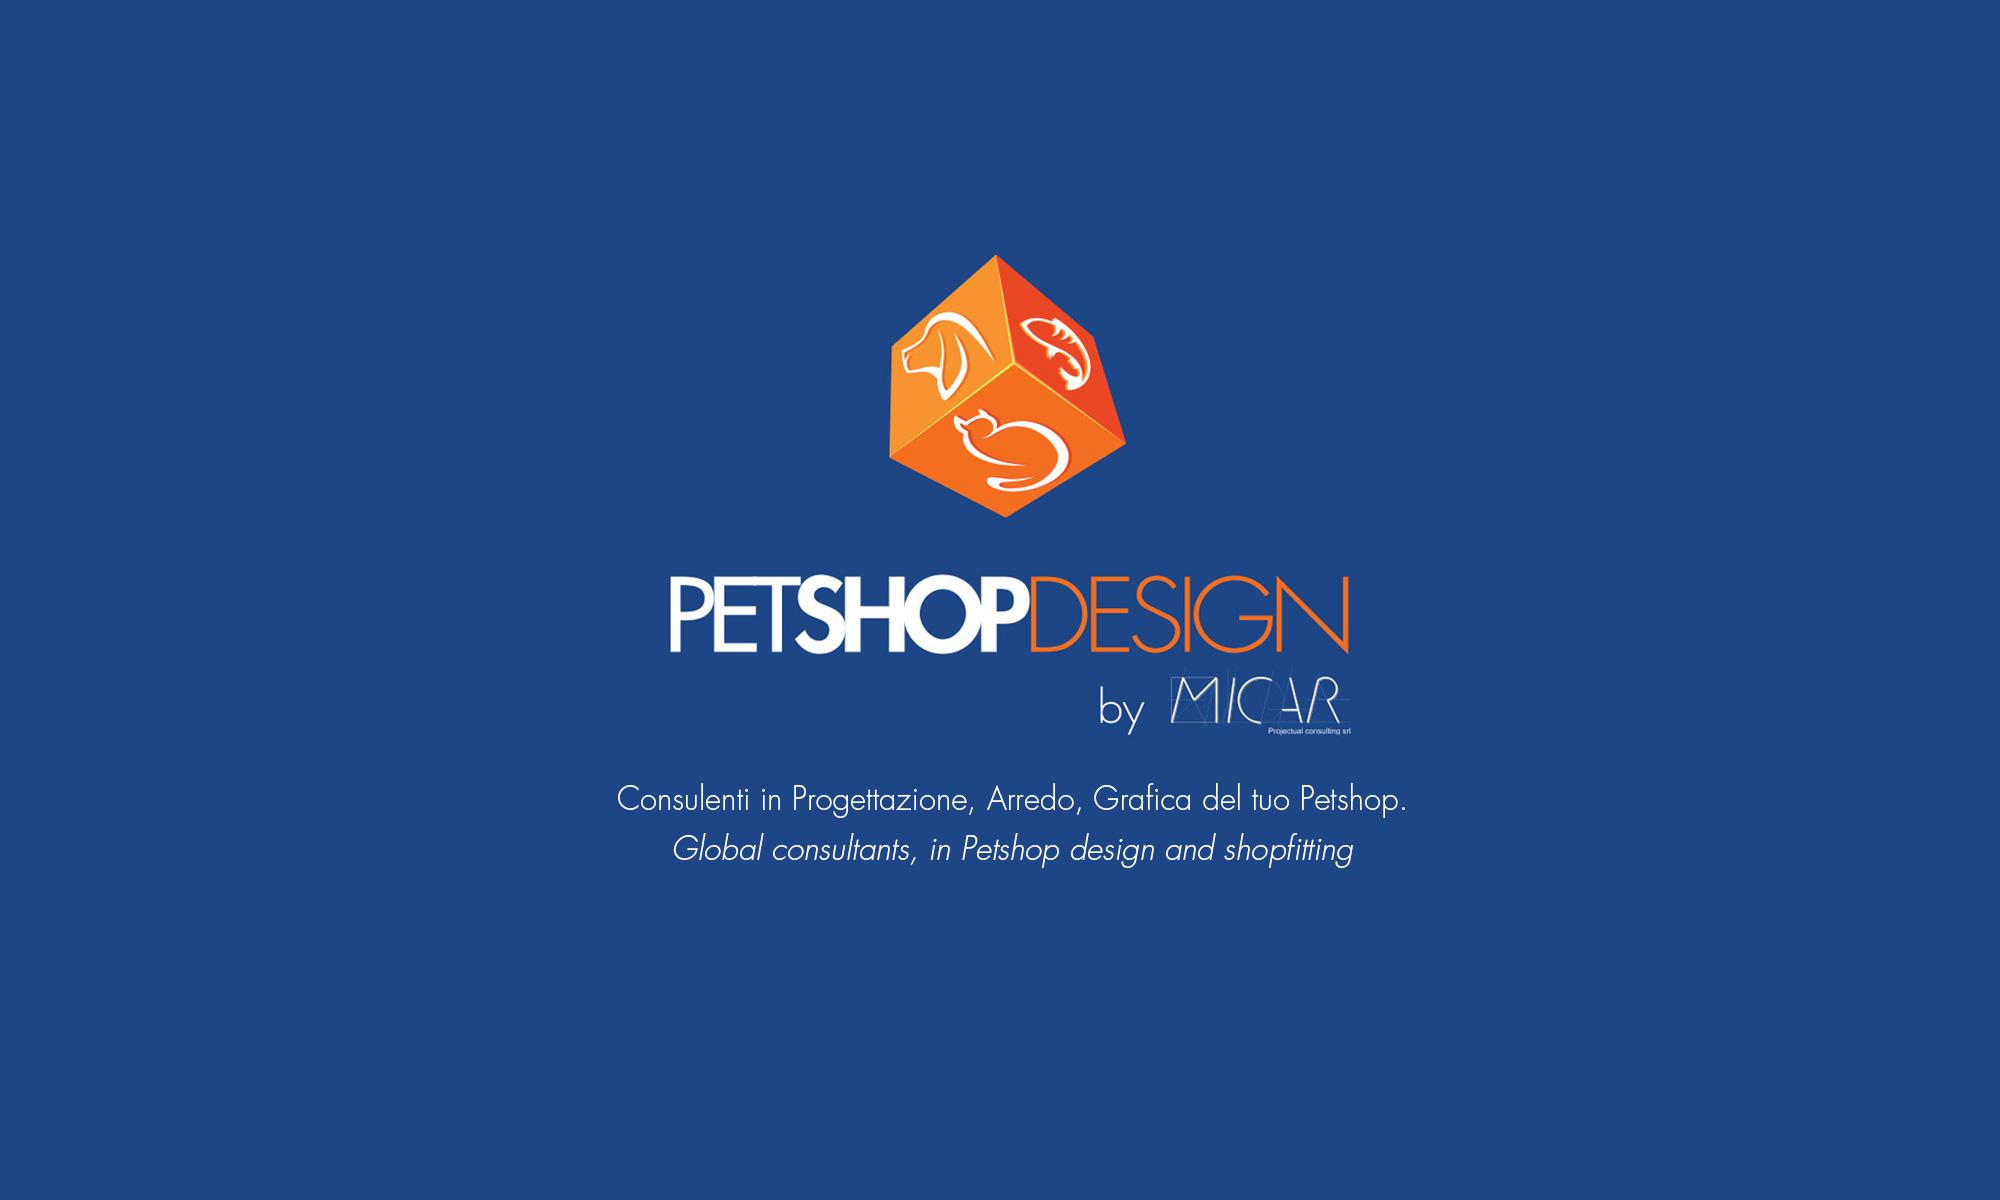 Petshopdesign